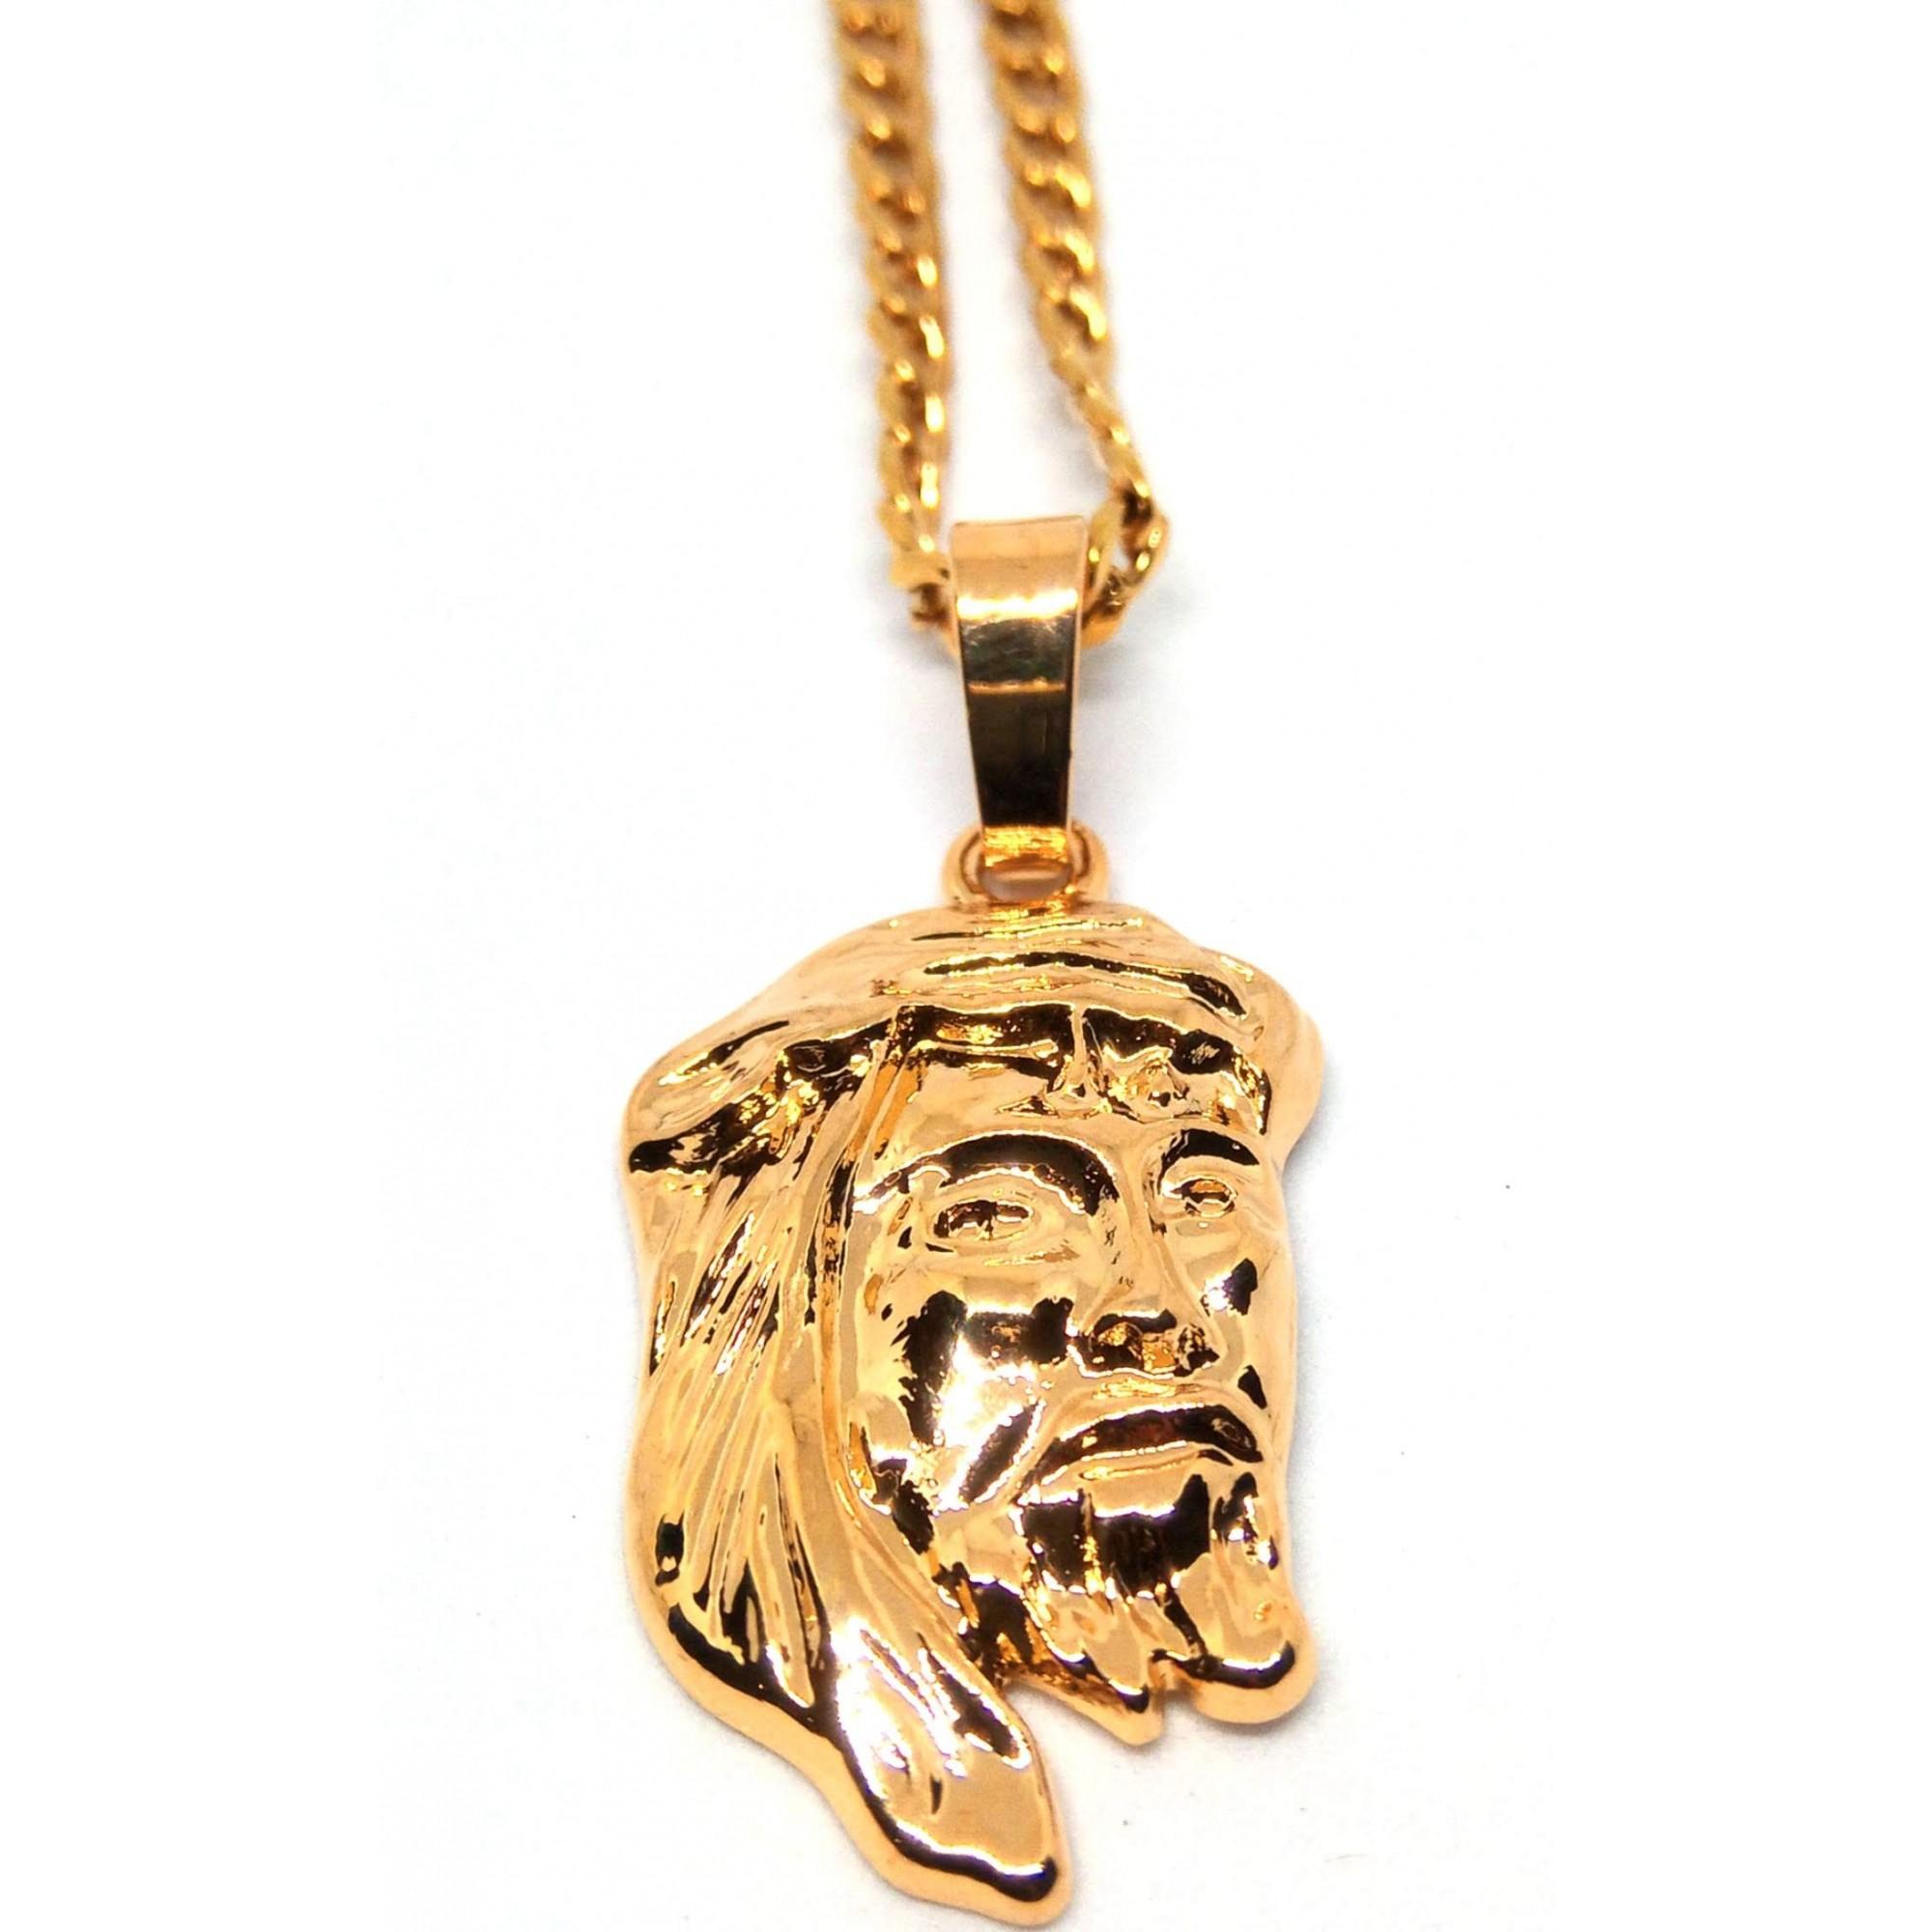 Cordão Corrente Groumet Banhada Ouro 18k Face de Cristo